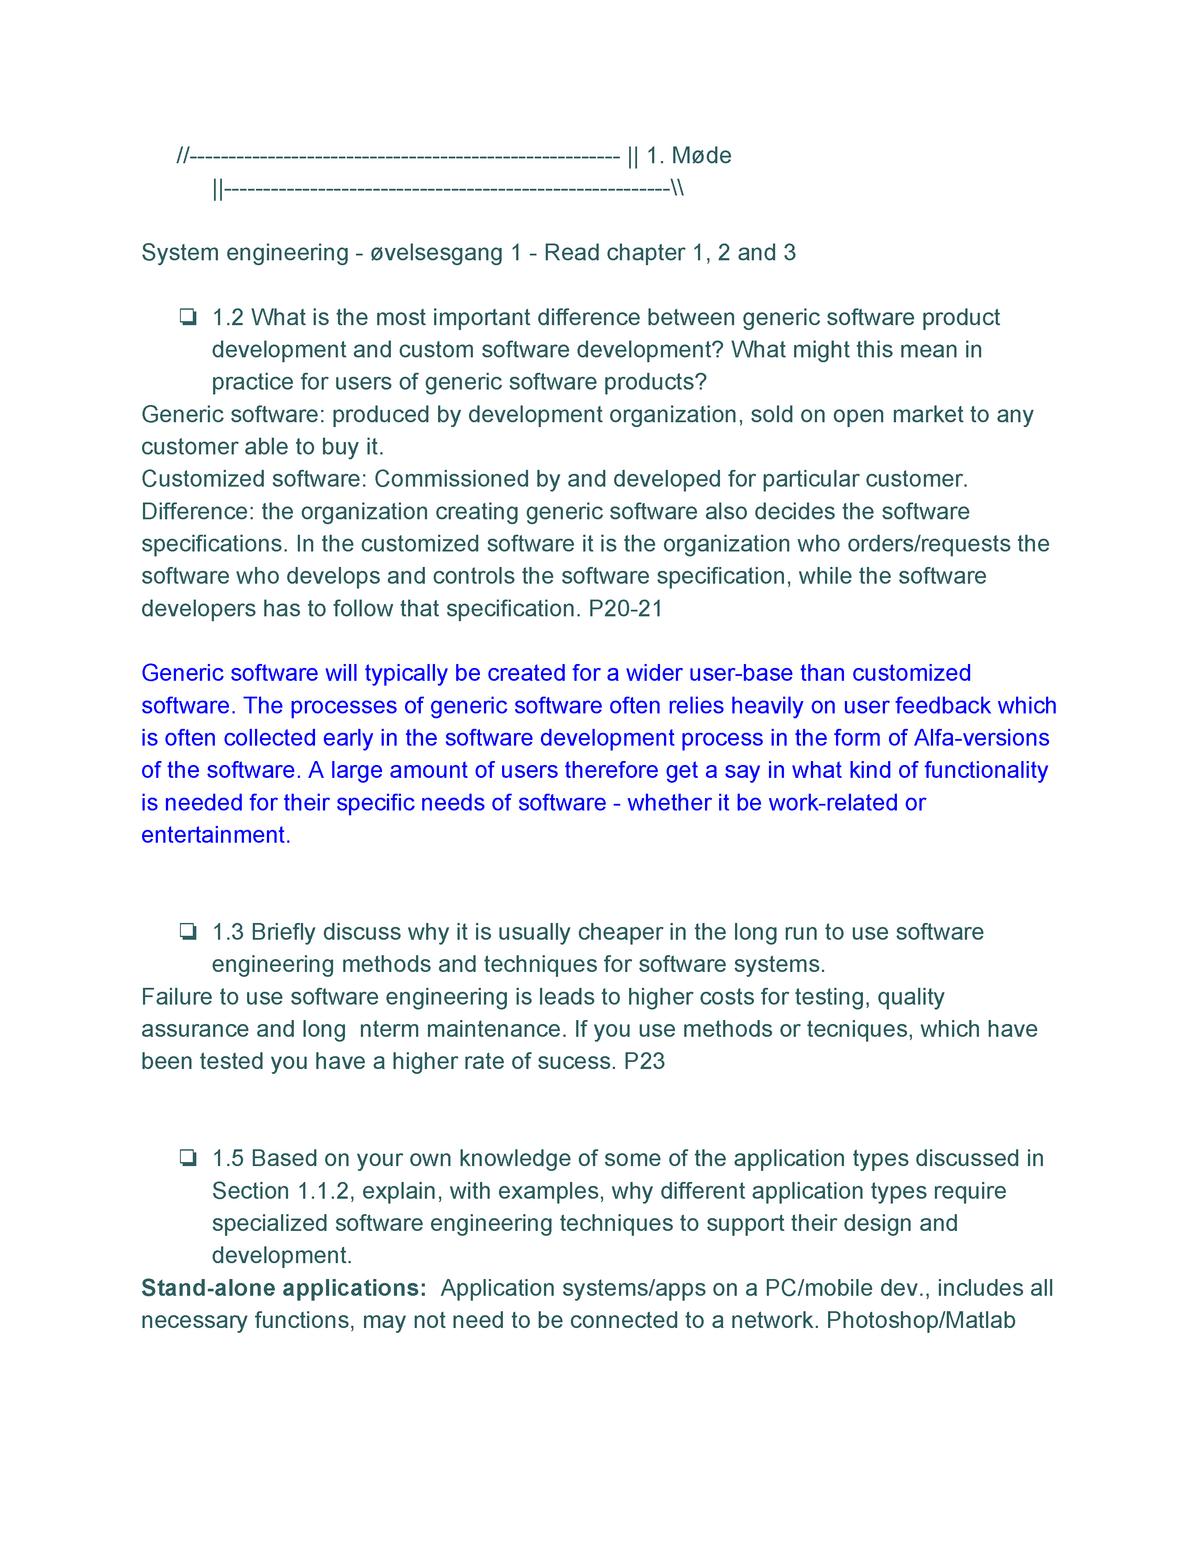 Software Engineering Eksamensforberedelse U26518 Ruc Studocu